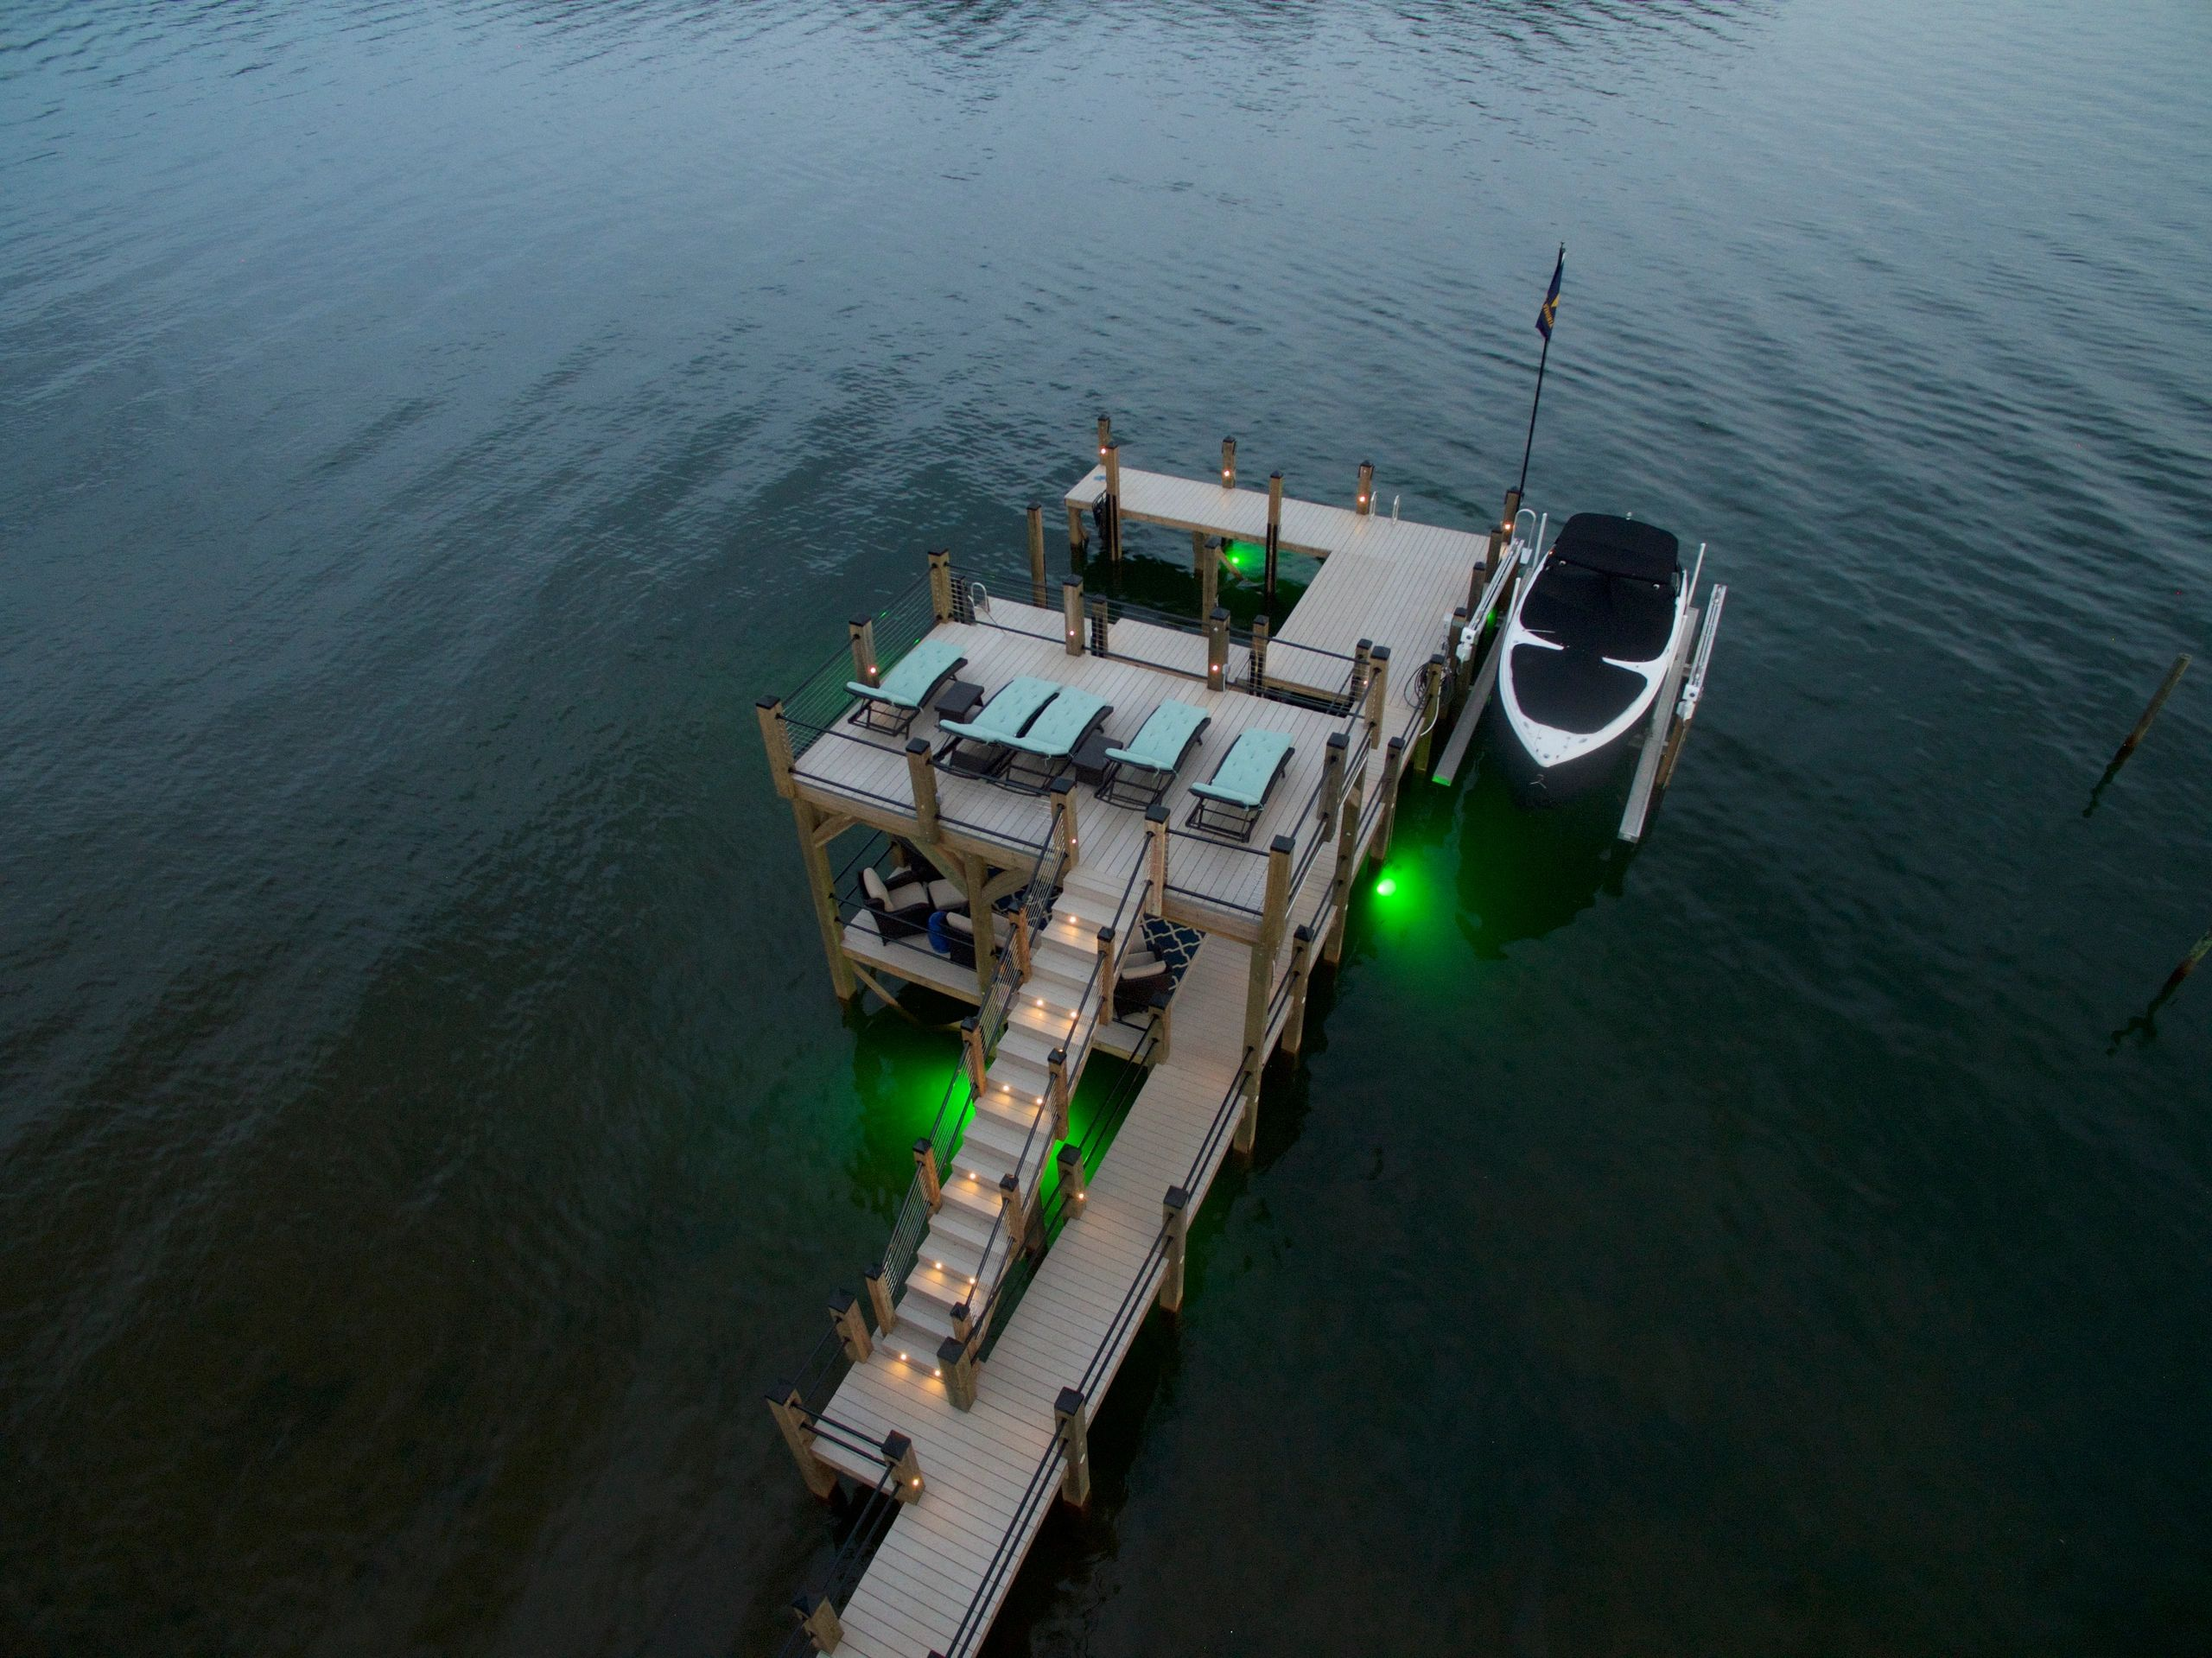 Lake norman electric